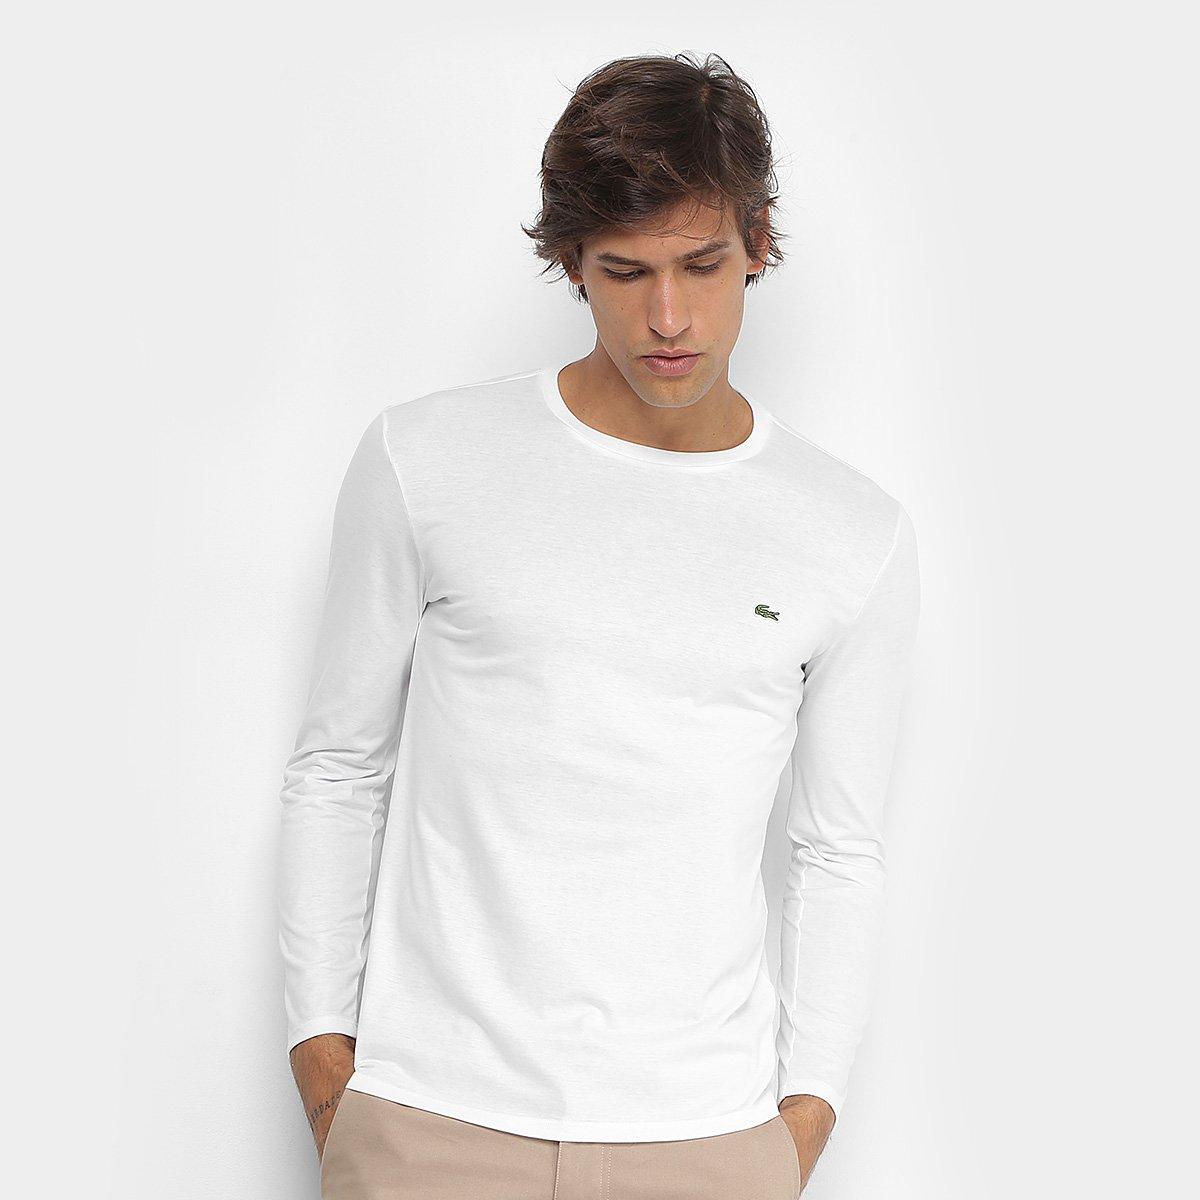 Camiseta Lacoste Básica Manga Longa Masculina - Compre Agora   Zattini 69594592da